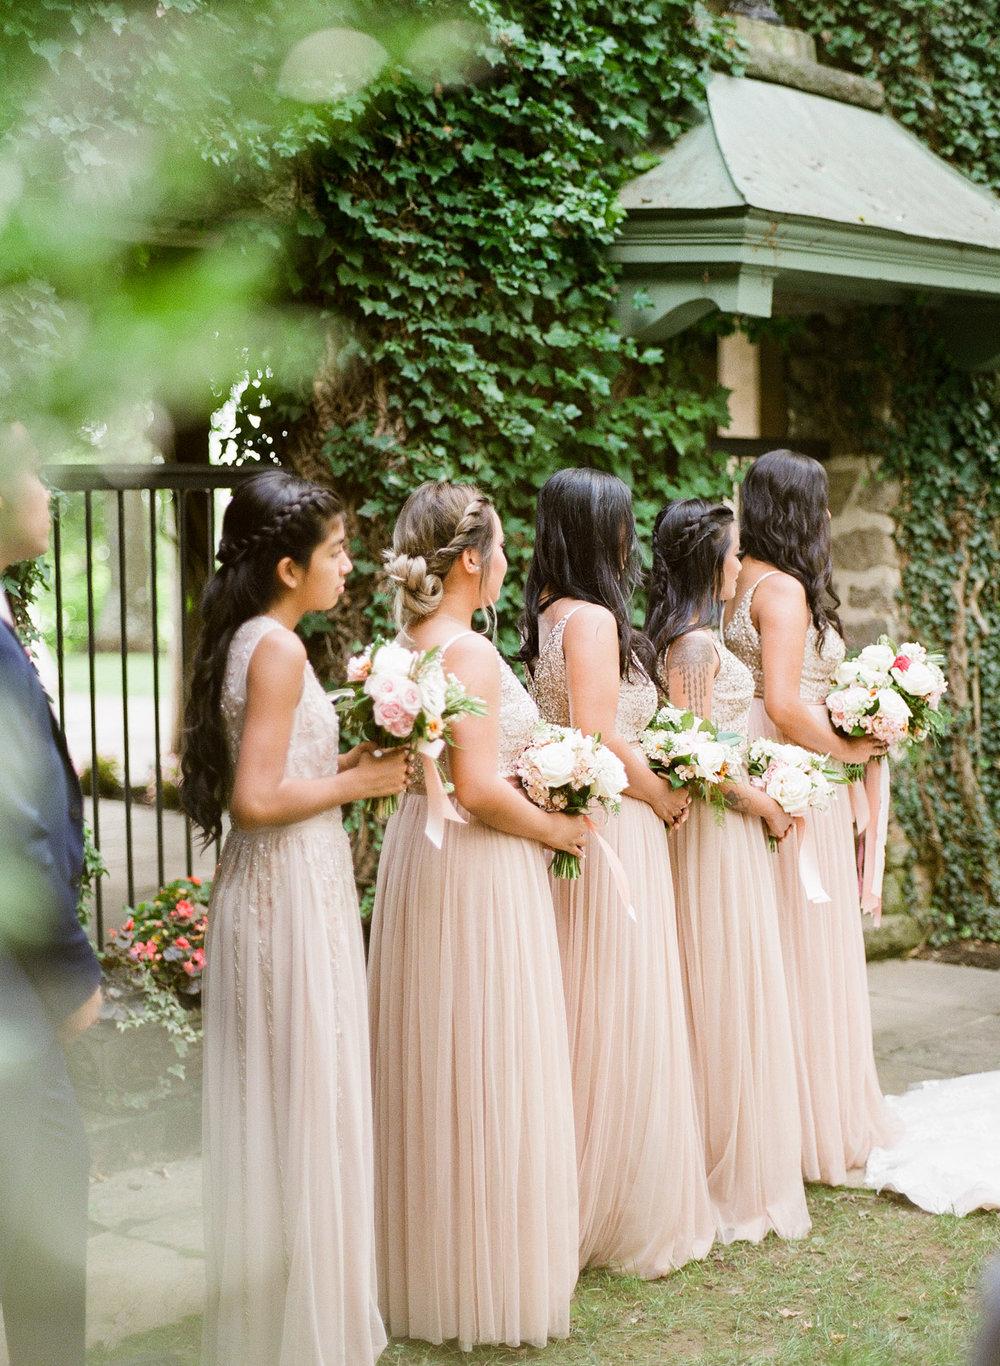 Virginia-Film-Photographer-Wedding-14.jpg